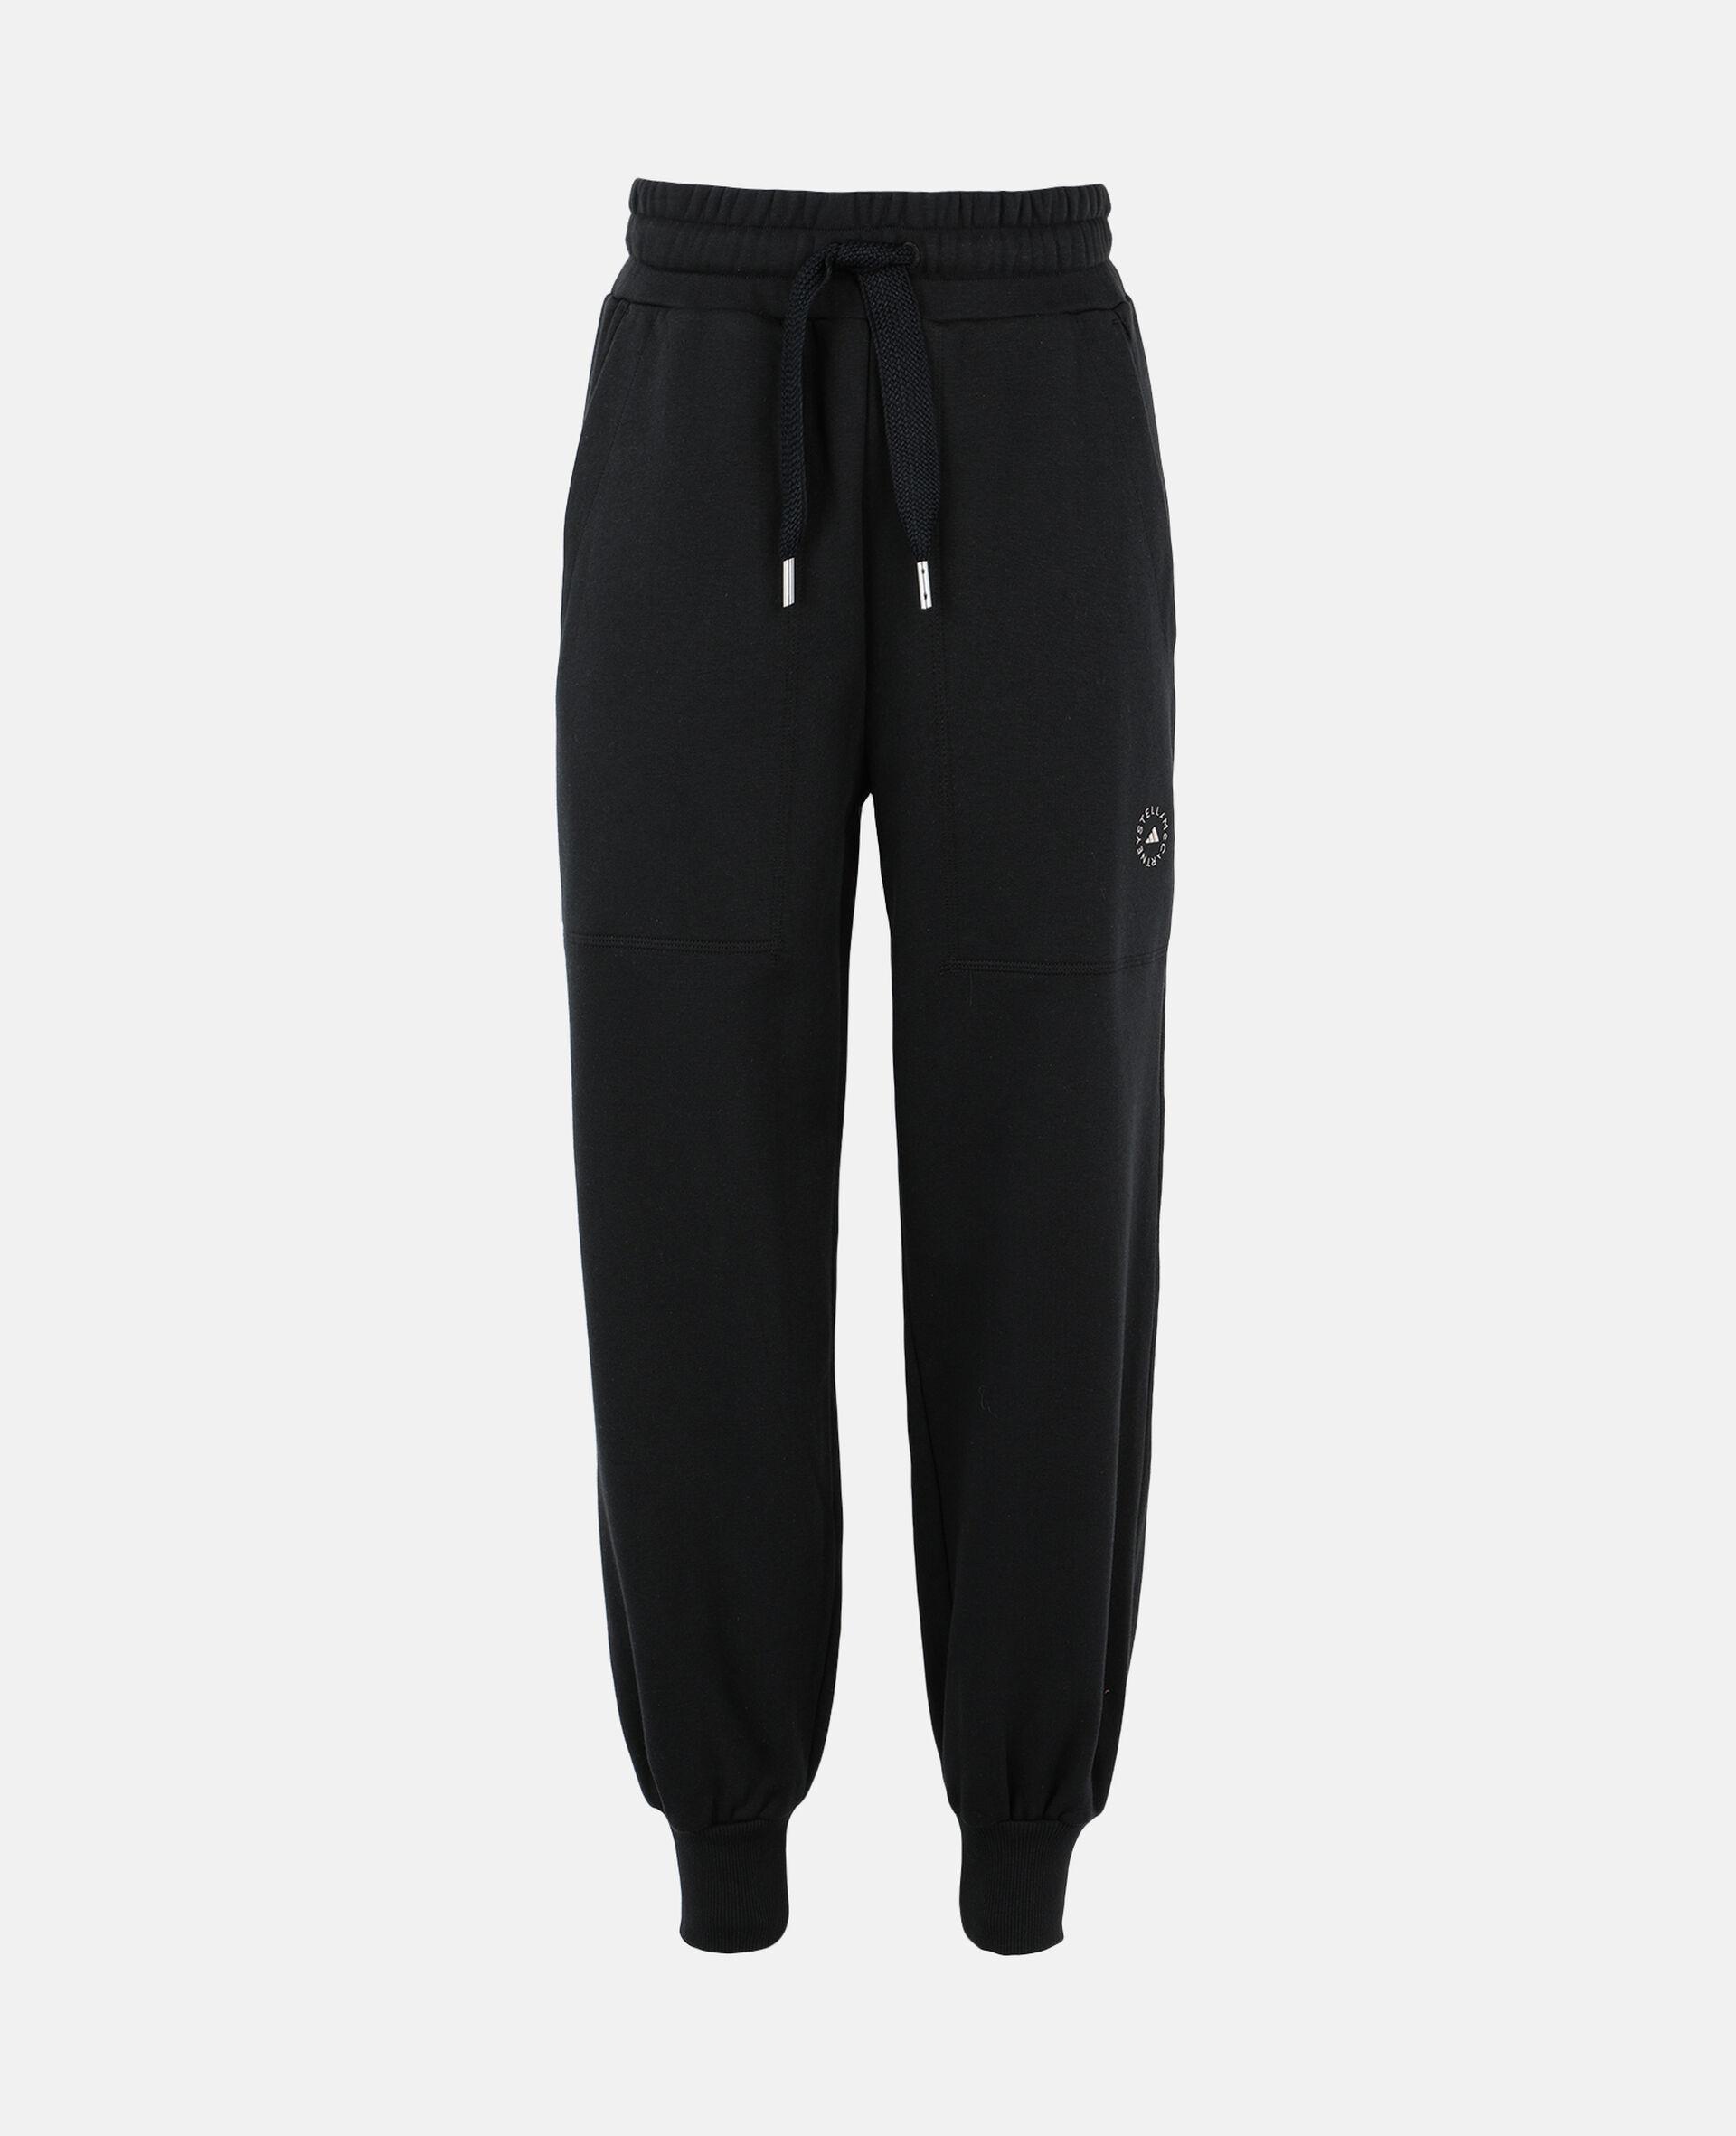 Grey Training Sweatpants-Black-large image number 0